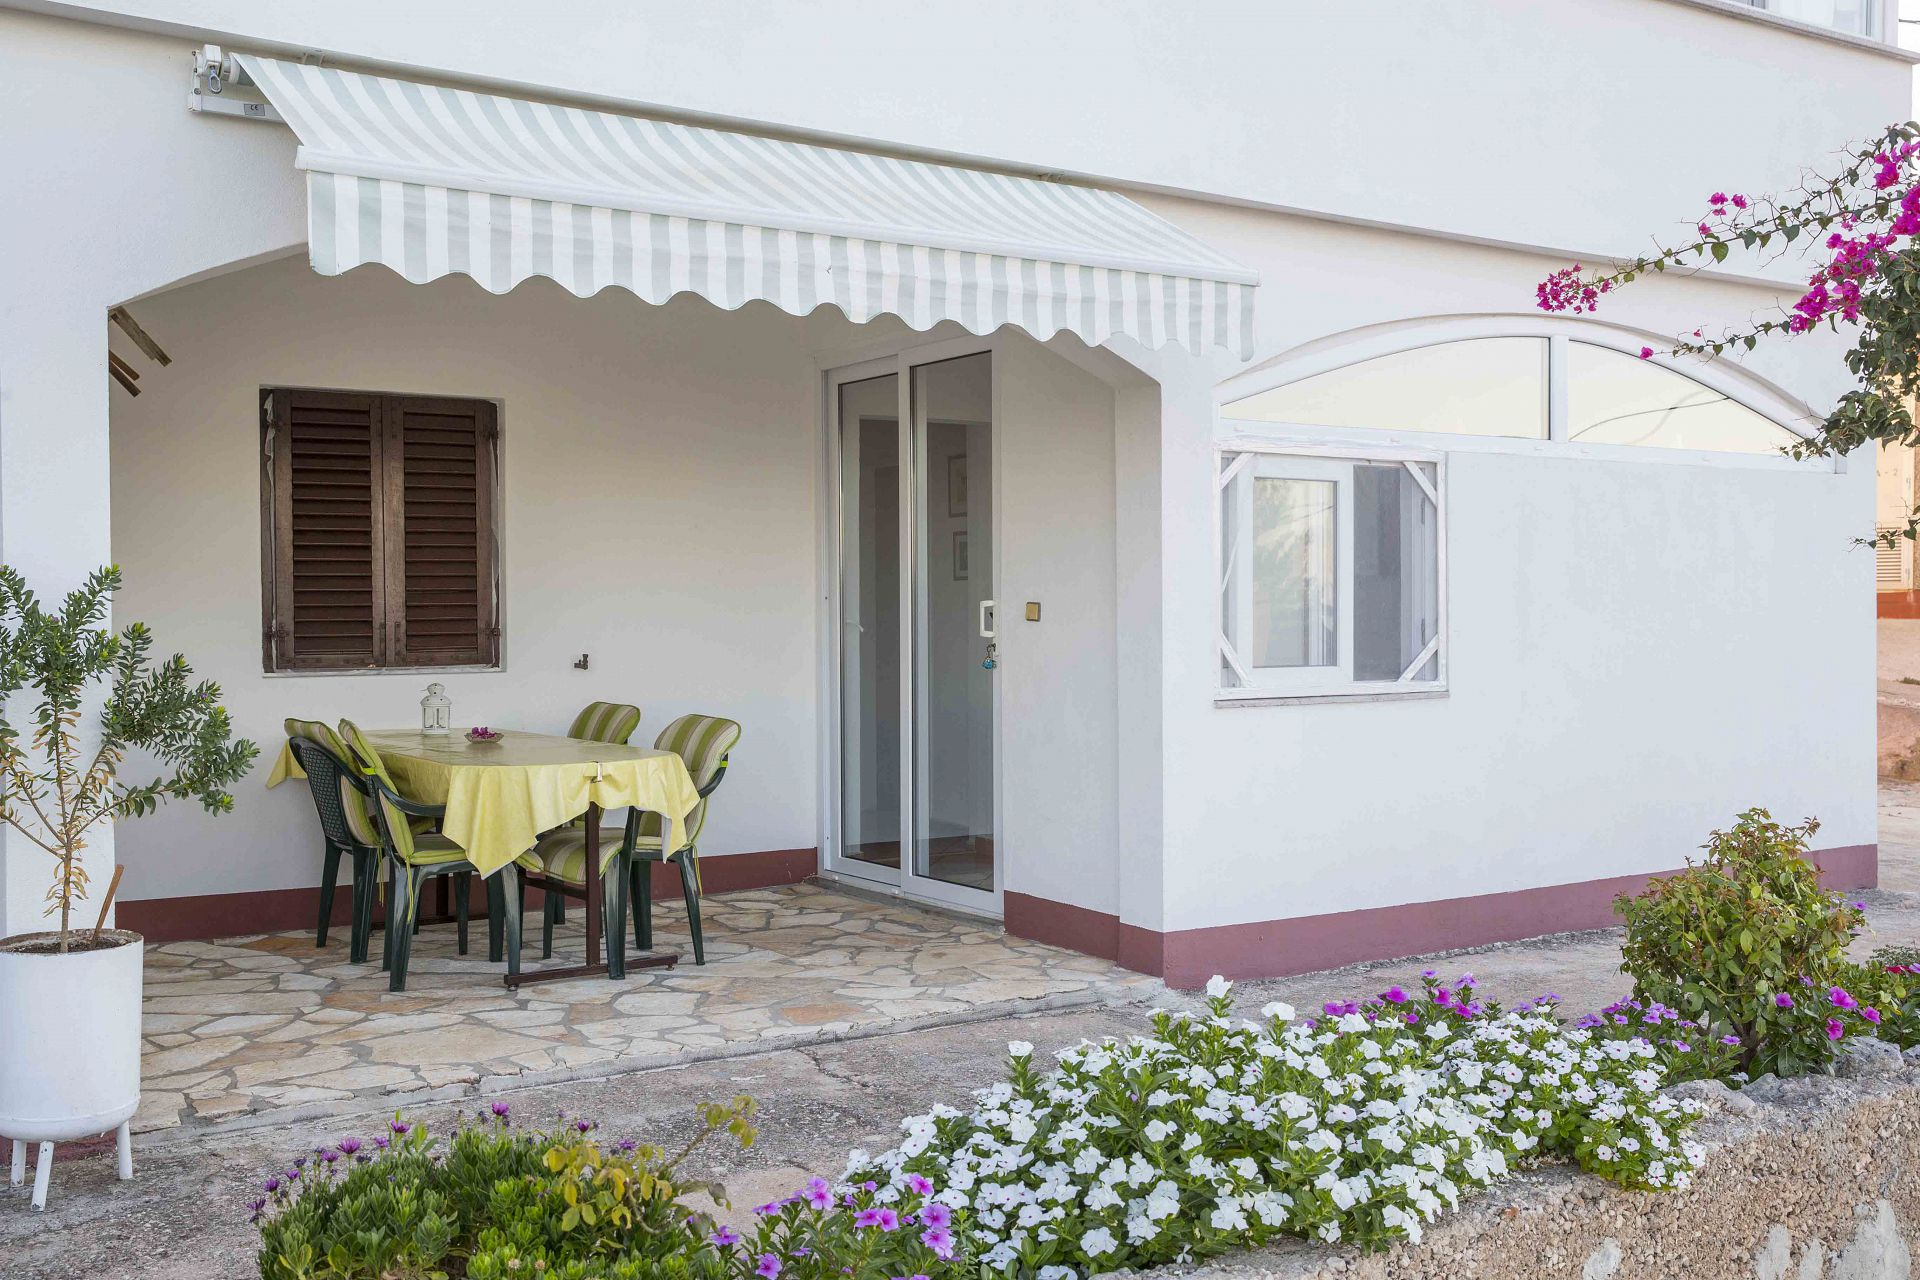 00603ZAVA - Zavala - Appartementen Kroatië - Meri(4): terras